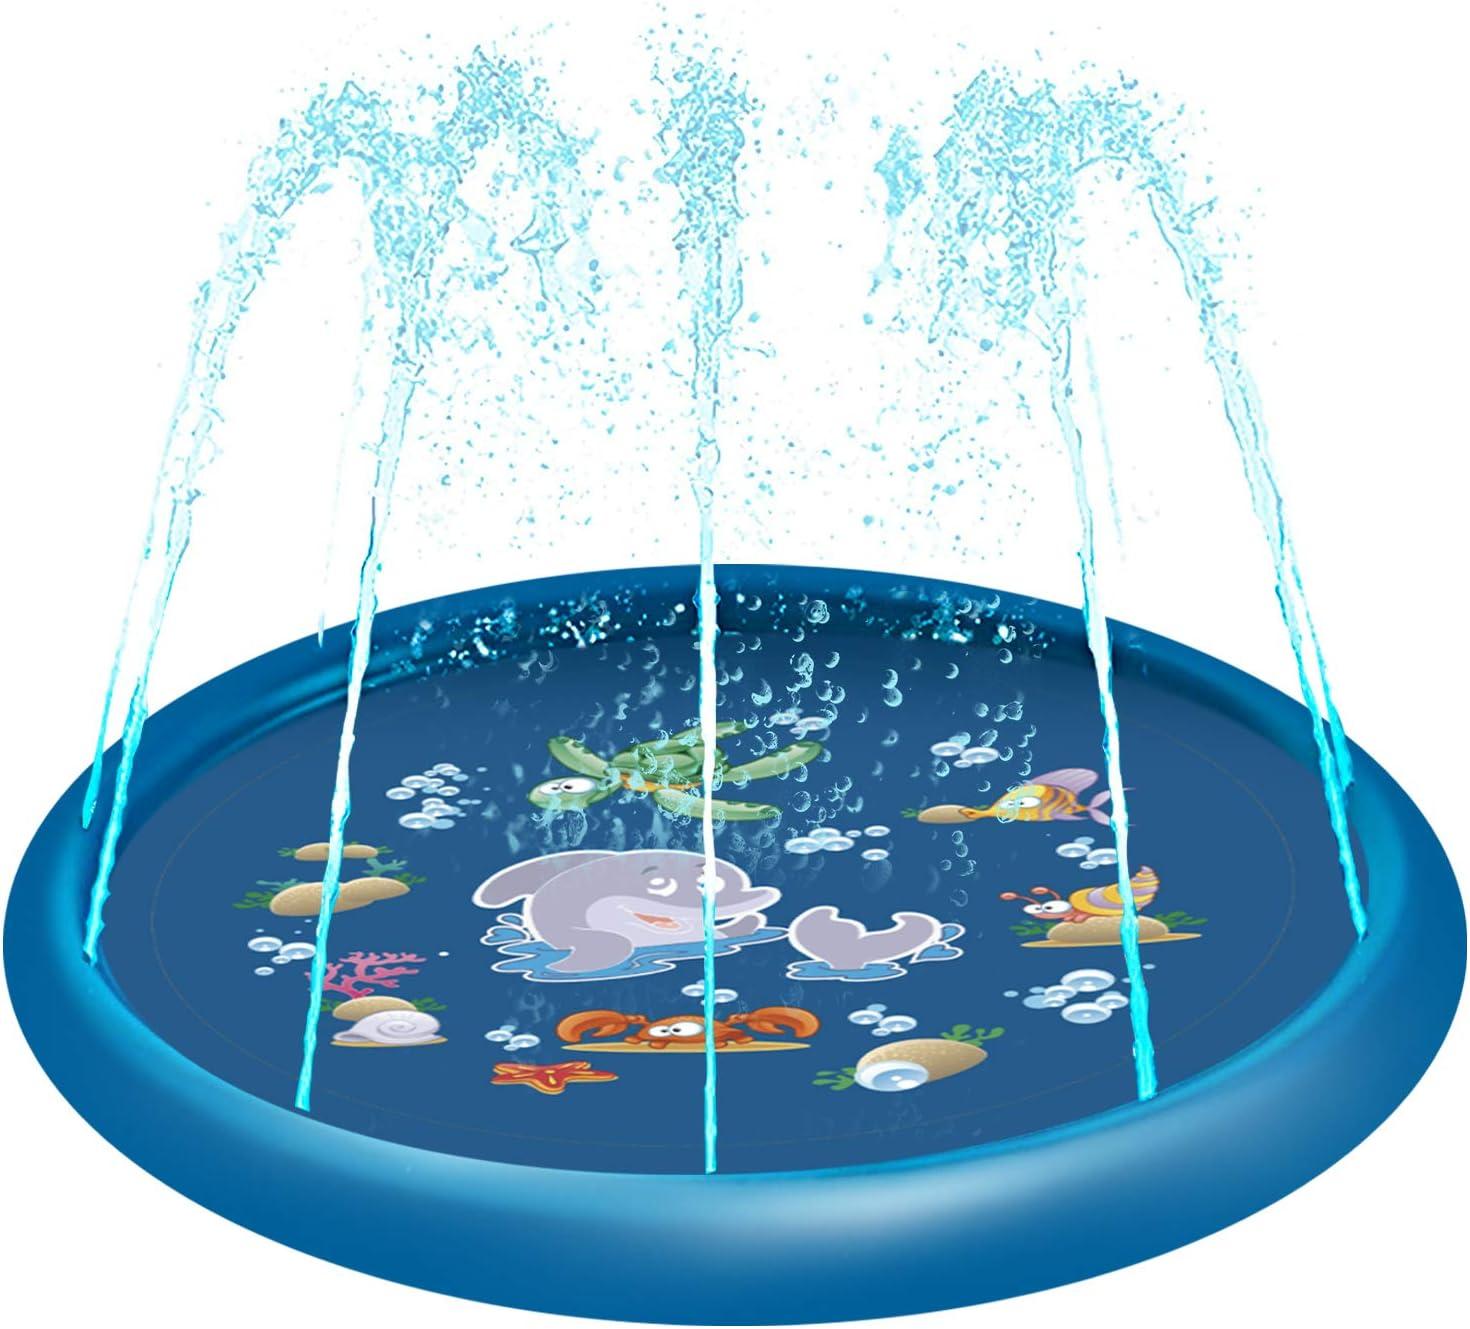 Perfect Summer Outdoor Party Sprinkler Toy 68 Splash Play Mat for Children Infants Toddlers Boys Girls Kids Mirooyu Splash Pad